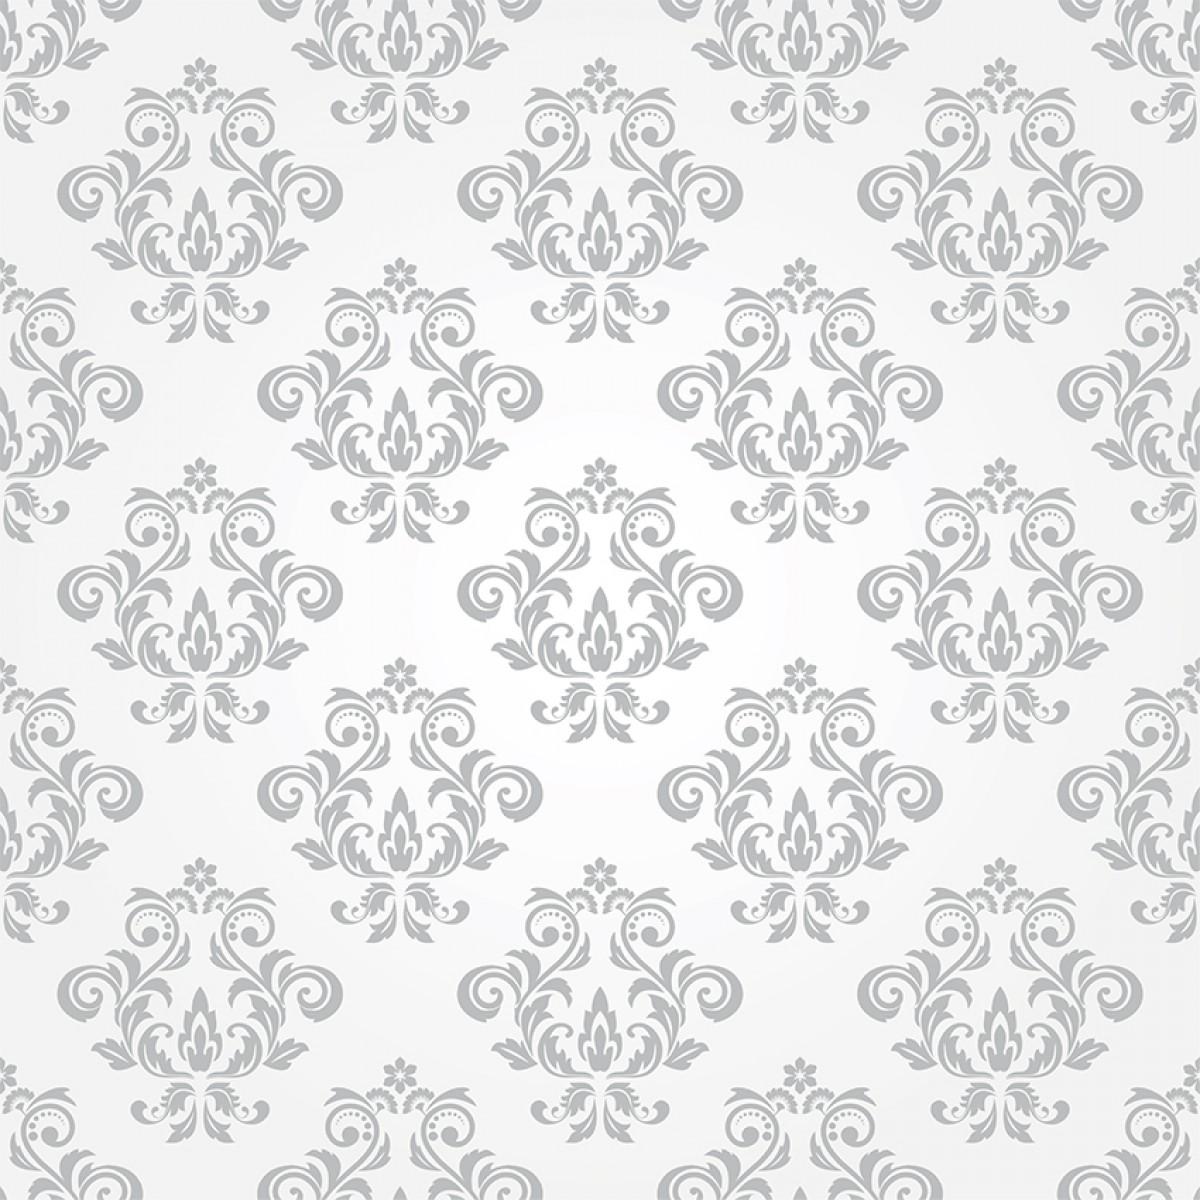 Papel de parede singular print decor elo7 - Papel para paredes ...